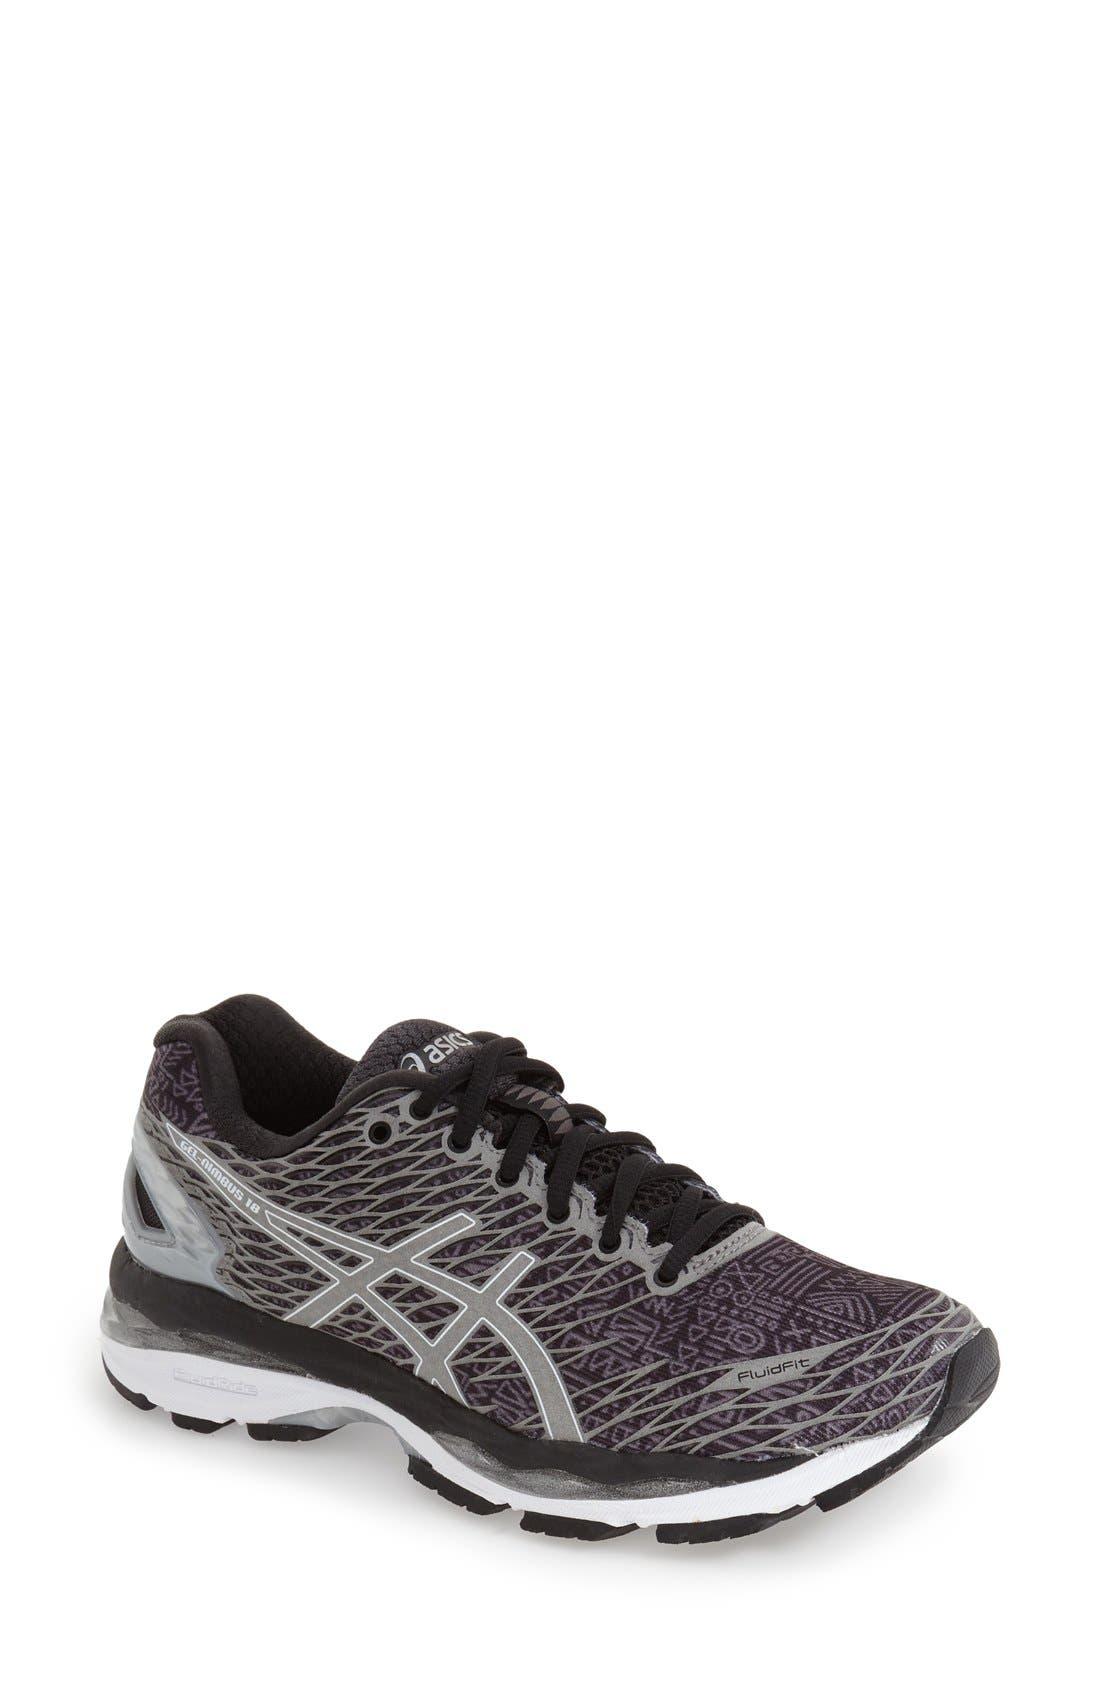 ASICS<SUP>®</SUP> 'GEL-Nimbus 18 Lite-Show' Running Shoe, Main, color, 003